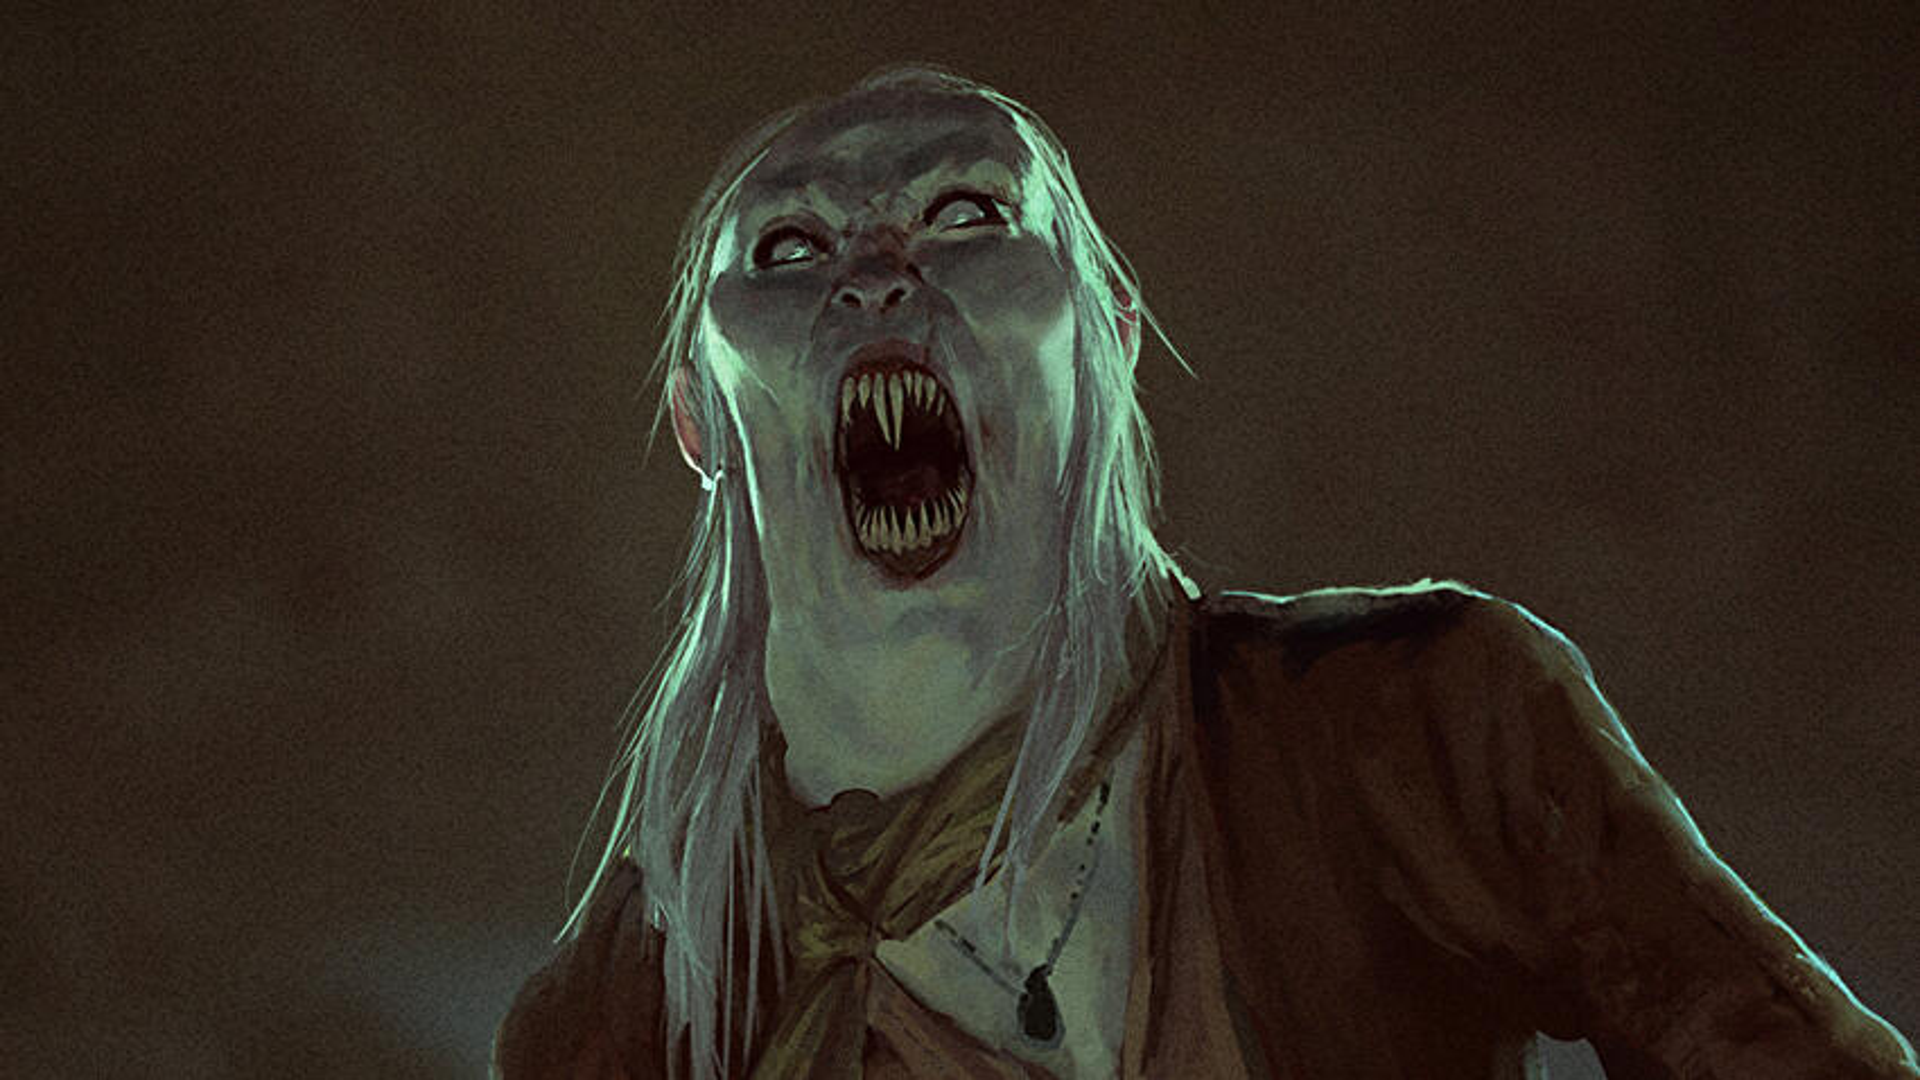 vampire-the-masquerade-chapters-board-game-nosferatu.jpg